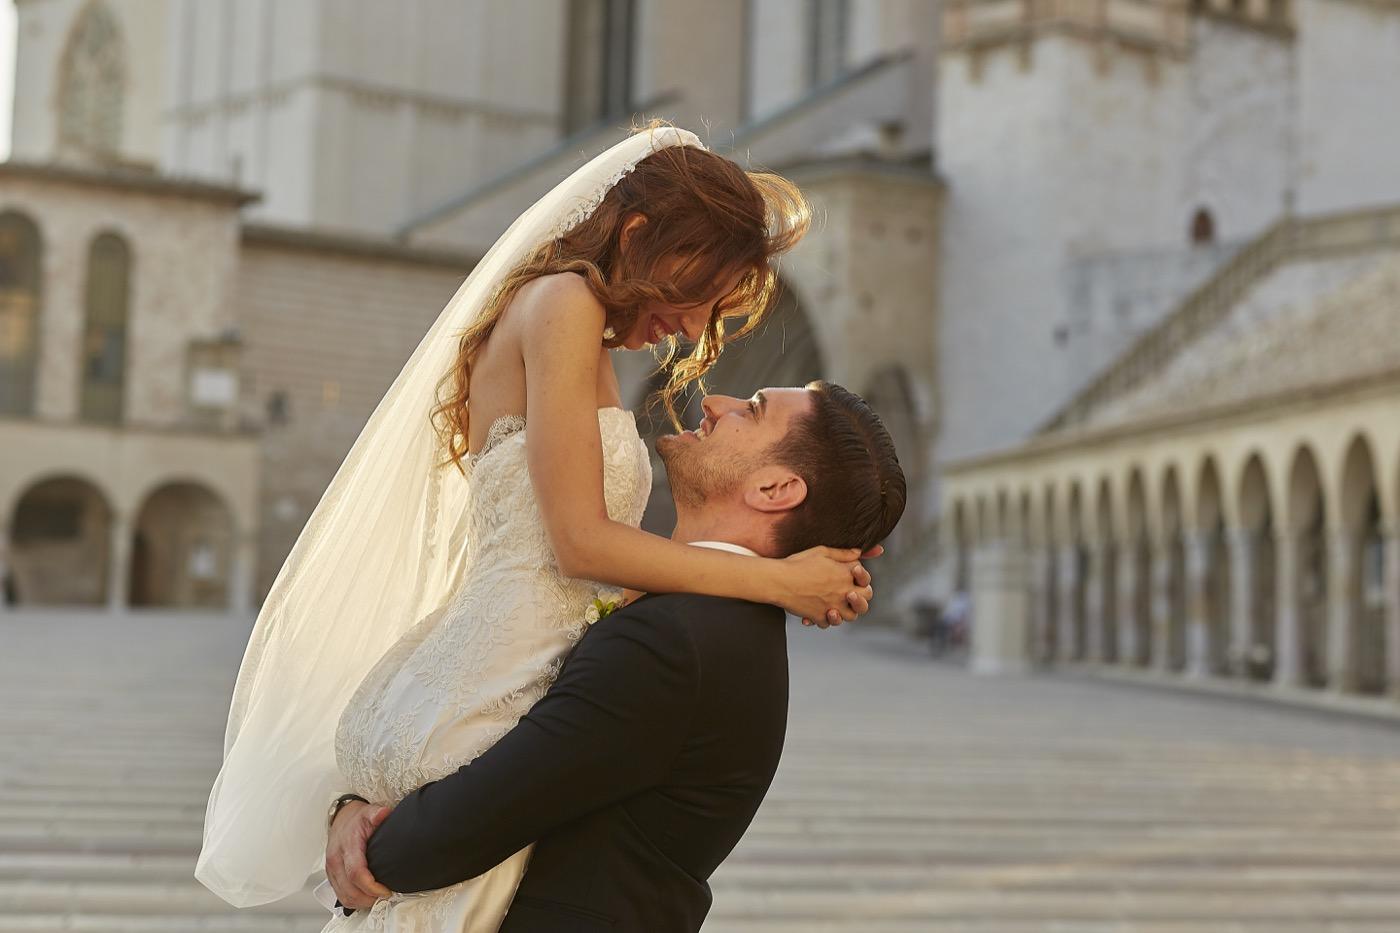 Claudio-Coppola-wedding-photographer-abbazia-7-frati-piegaro-72